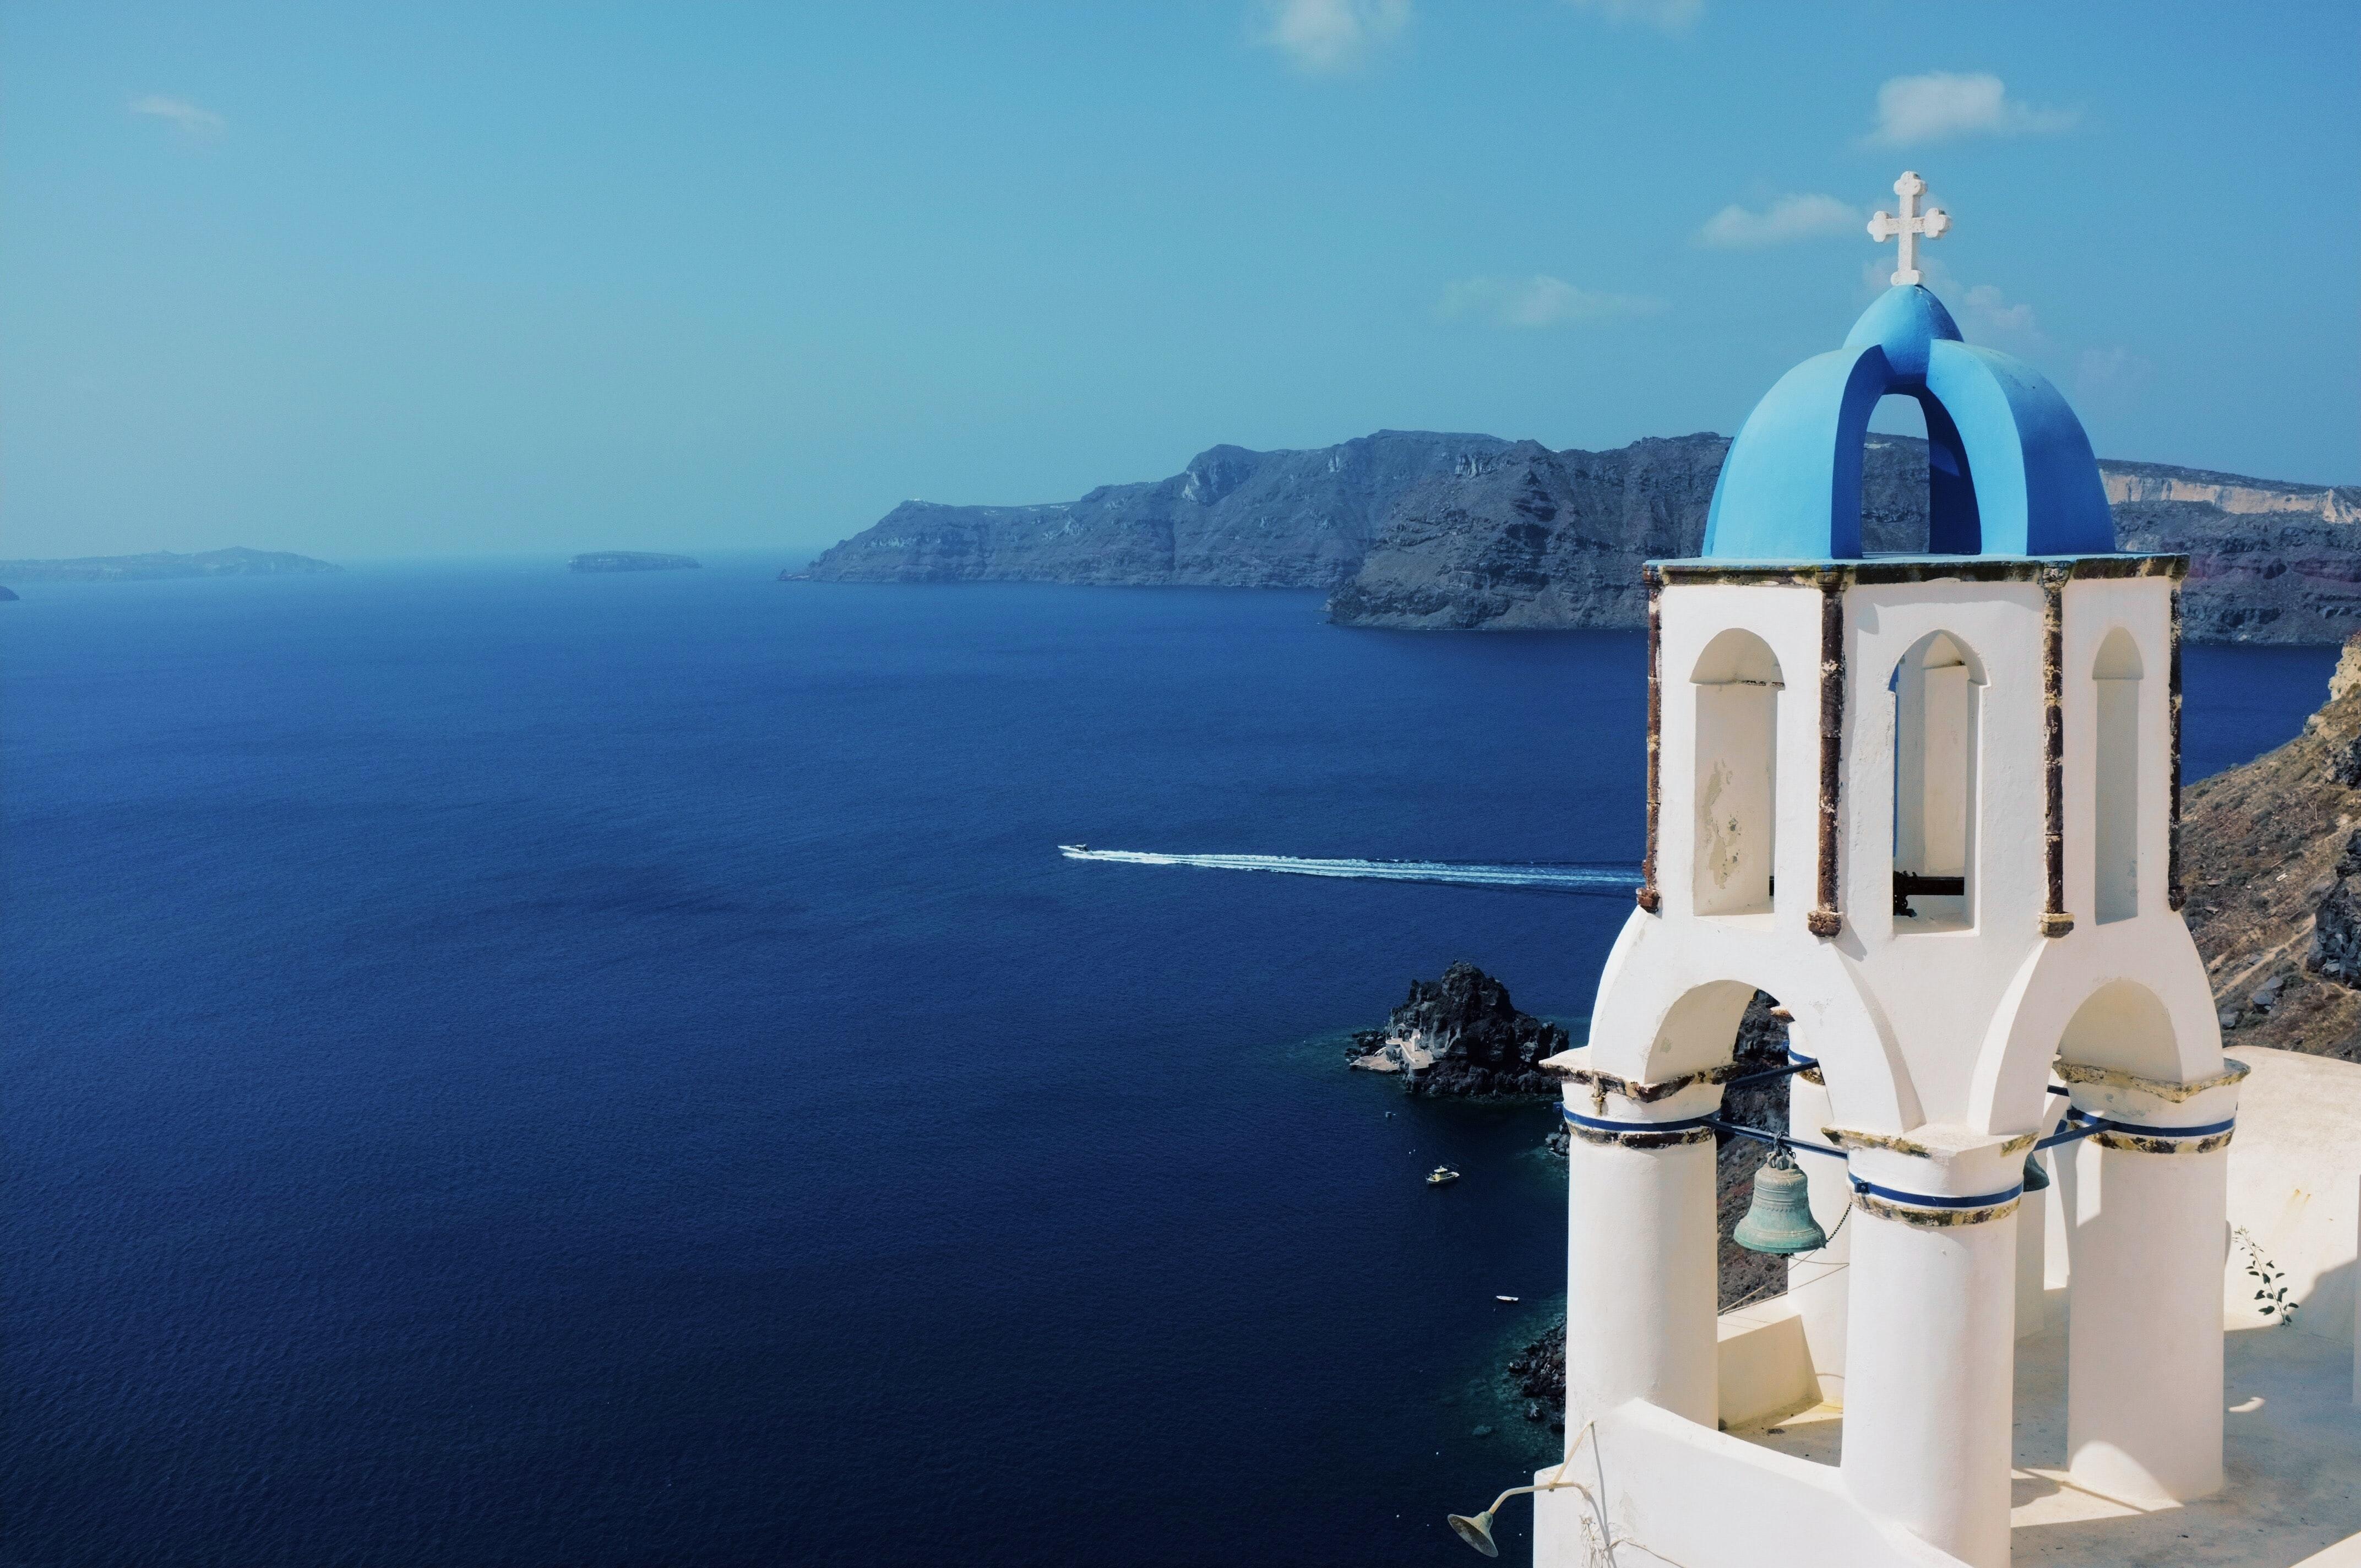 Church of Holycross, 10 Best Churches in Greece